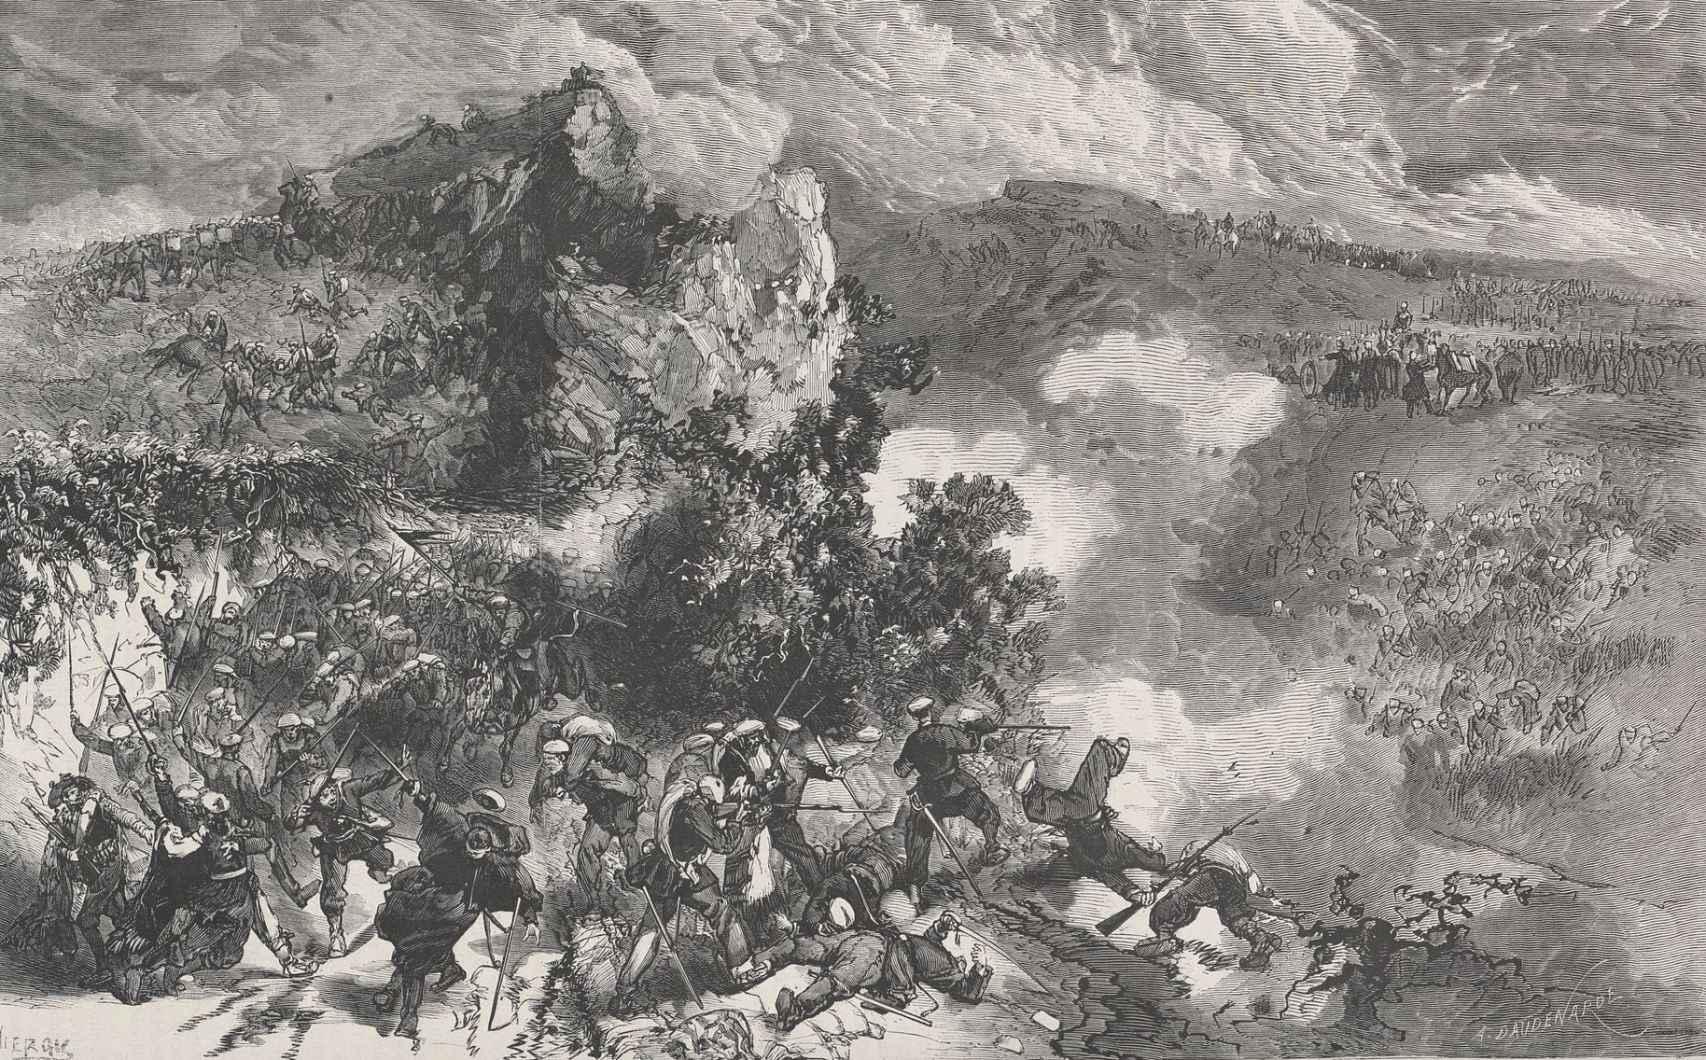 El combate de Mañaria, cerca de Bilbao (1872).